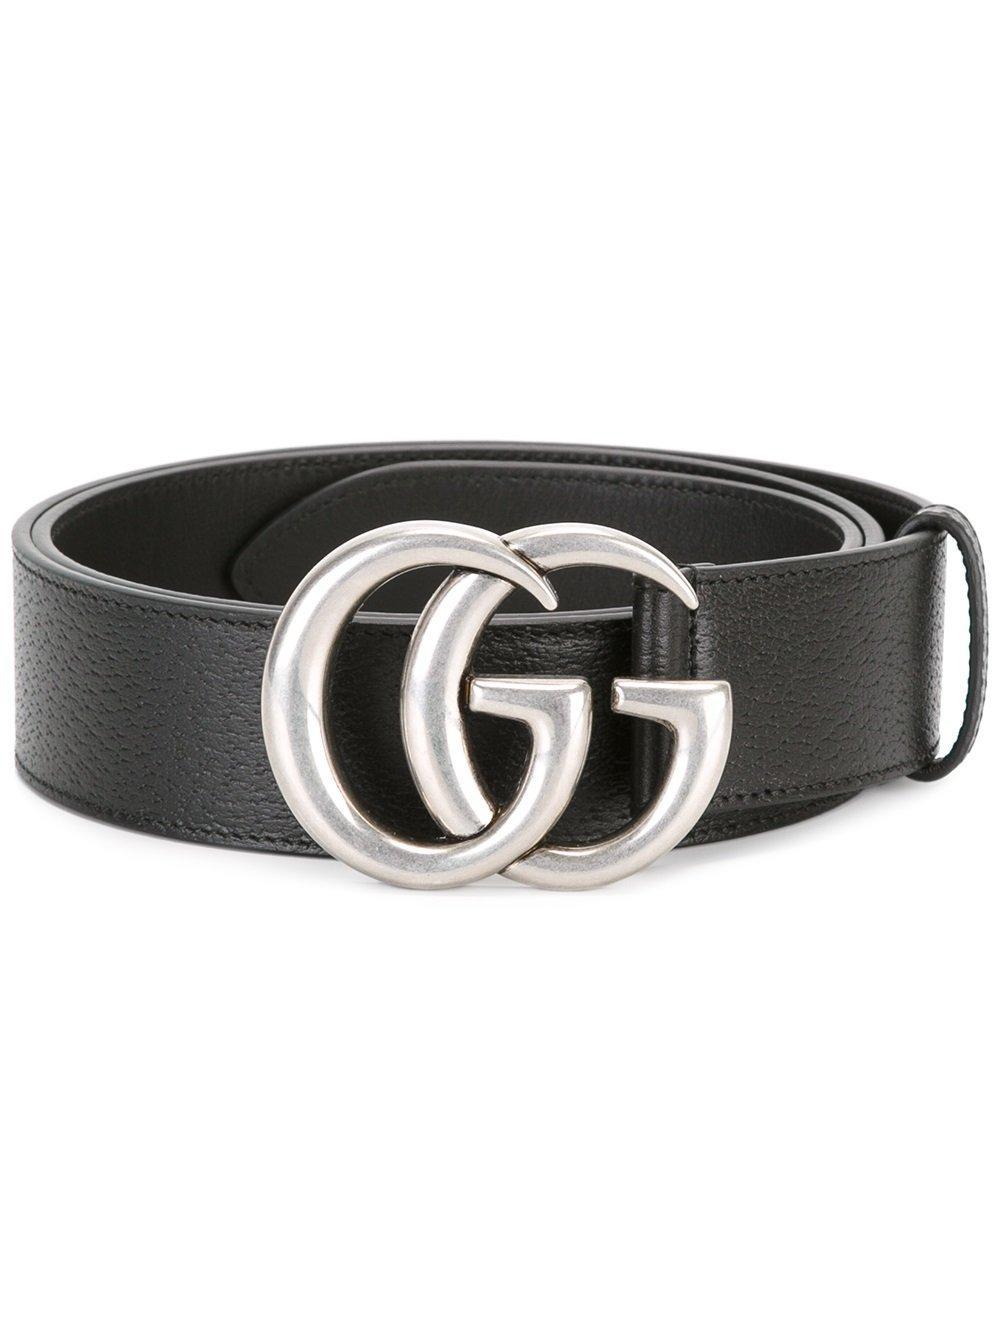 gucci gg buckle belt in black for men lyst